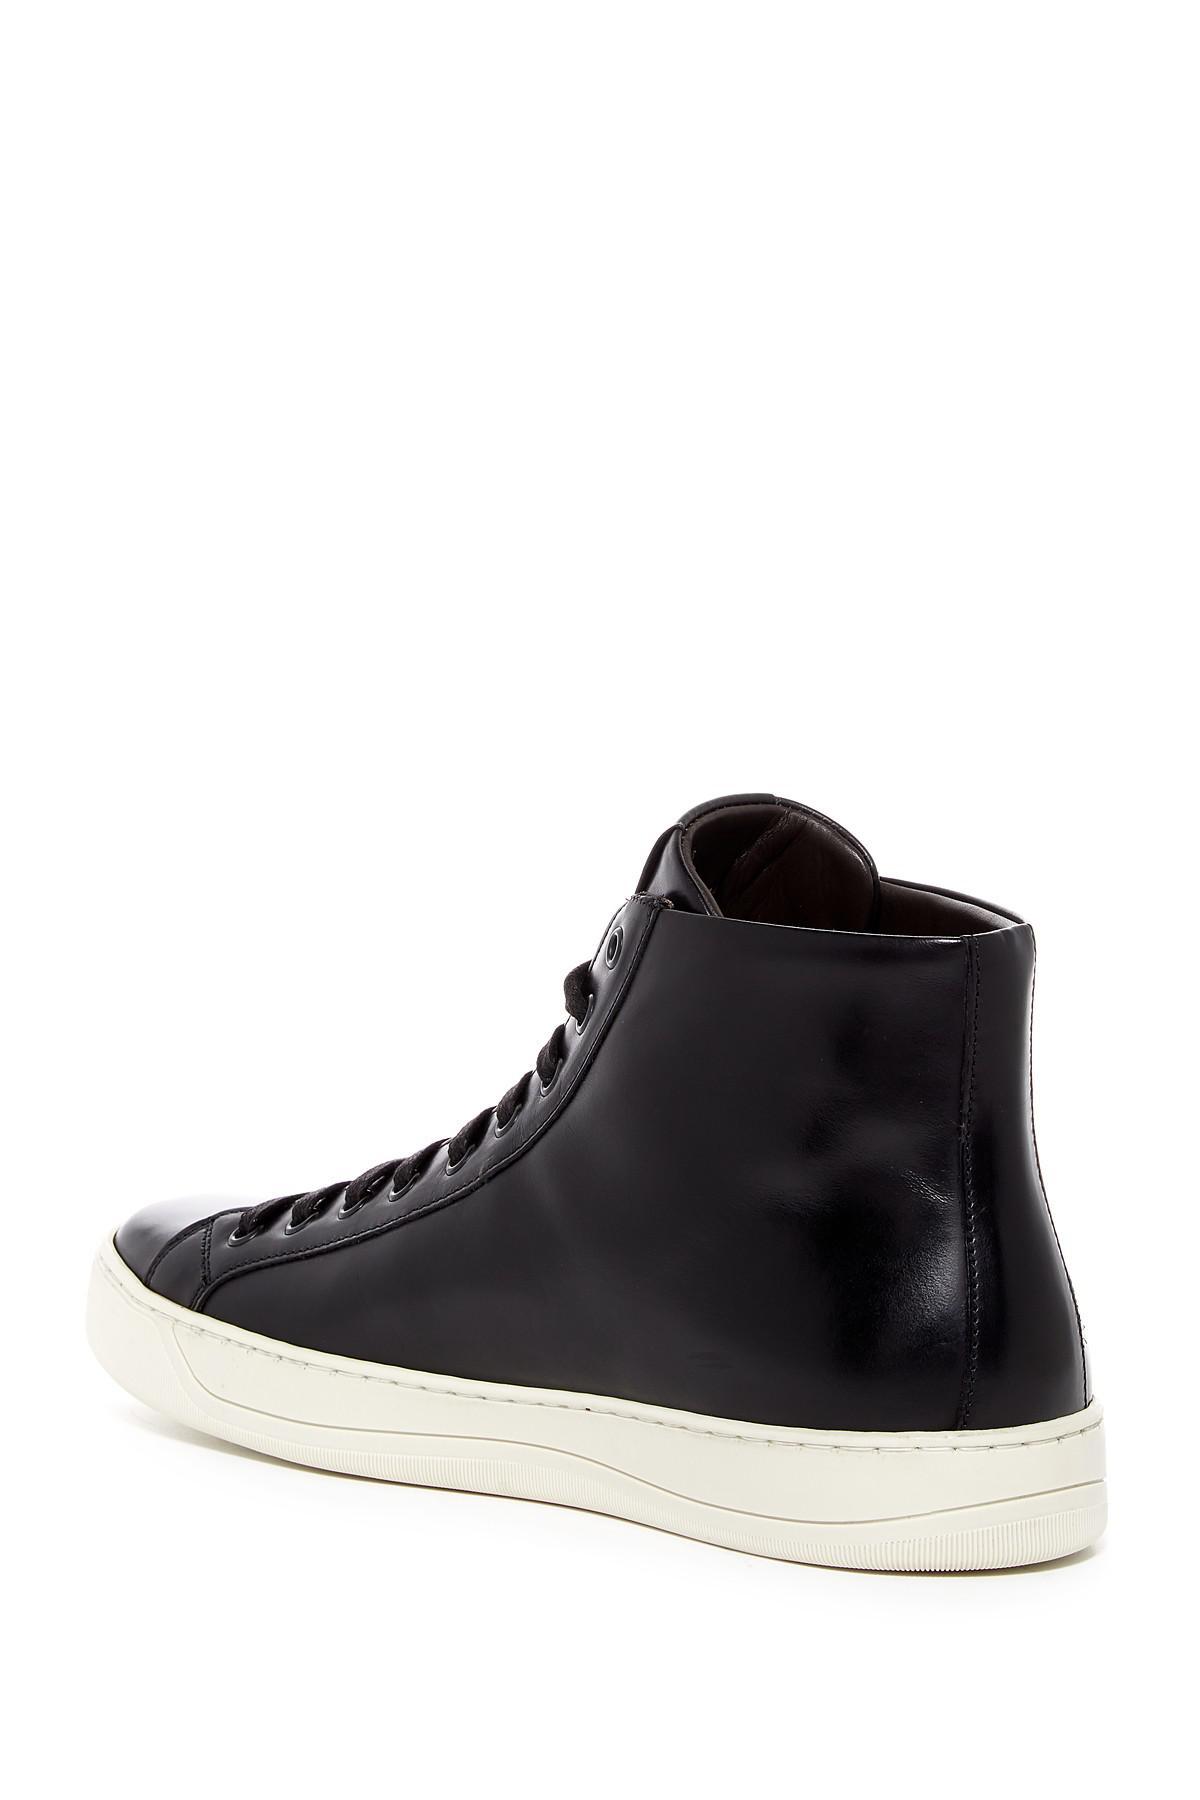 f1d14b7352f Lyst - Bruno Magli Wilson Leather Hi-top Sneaker in Black for Men